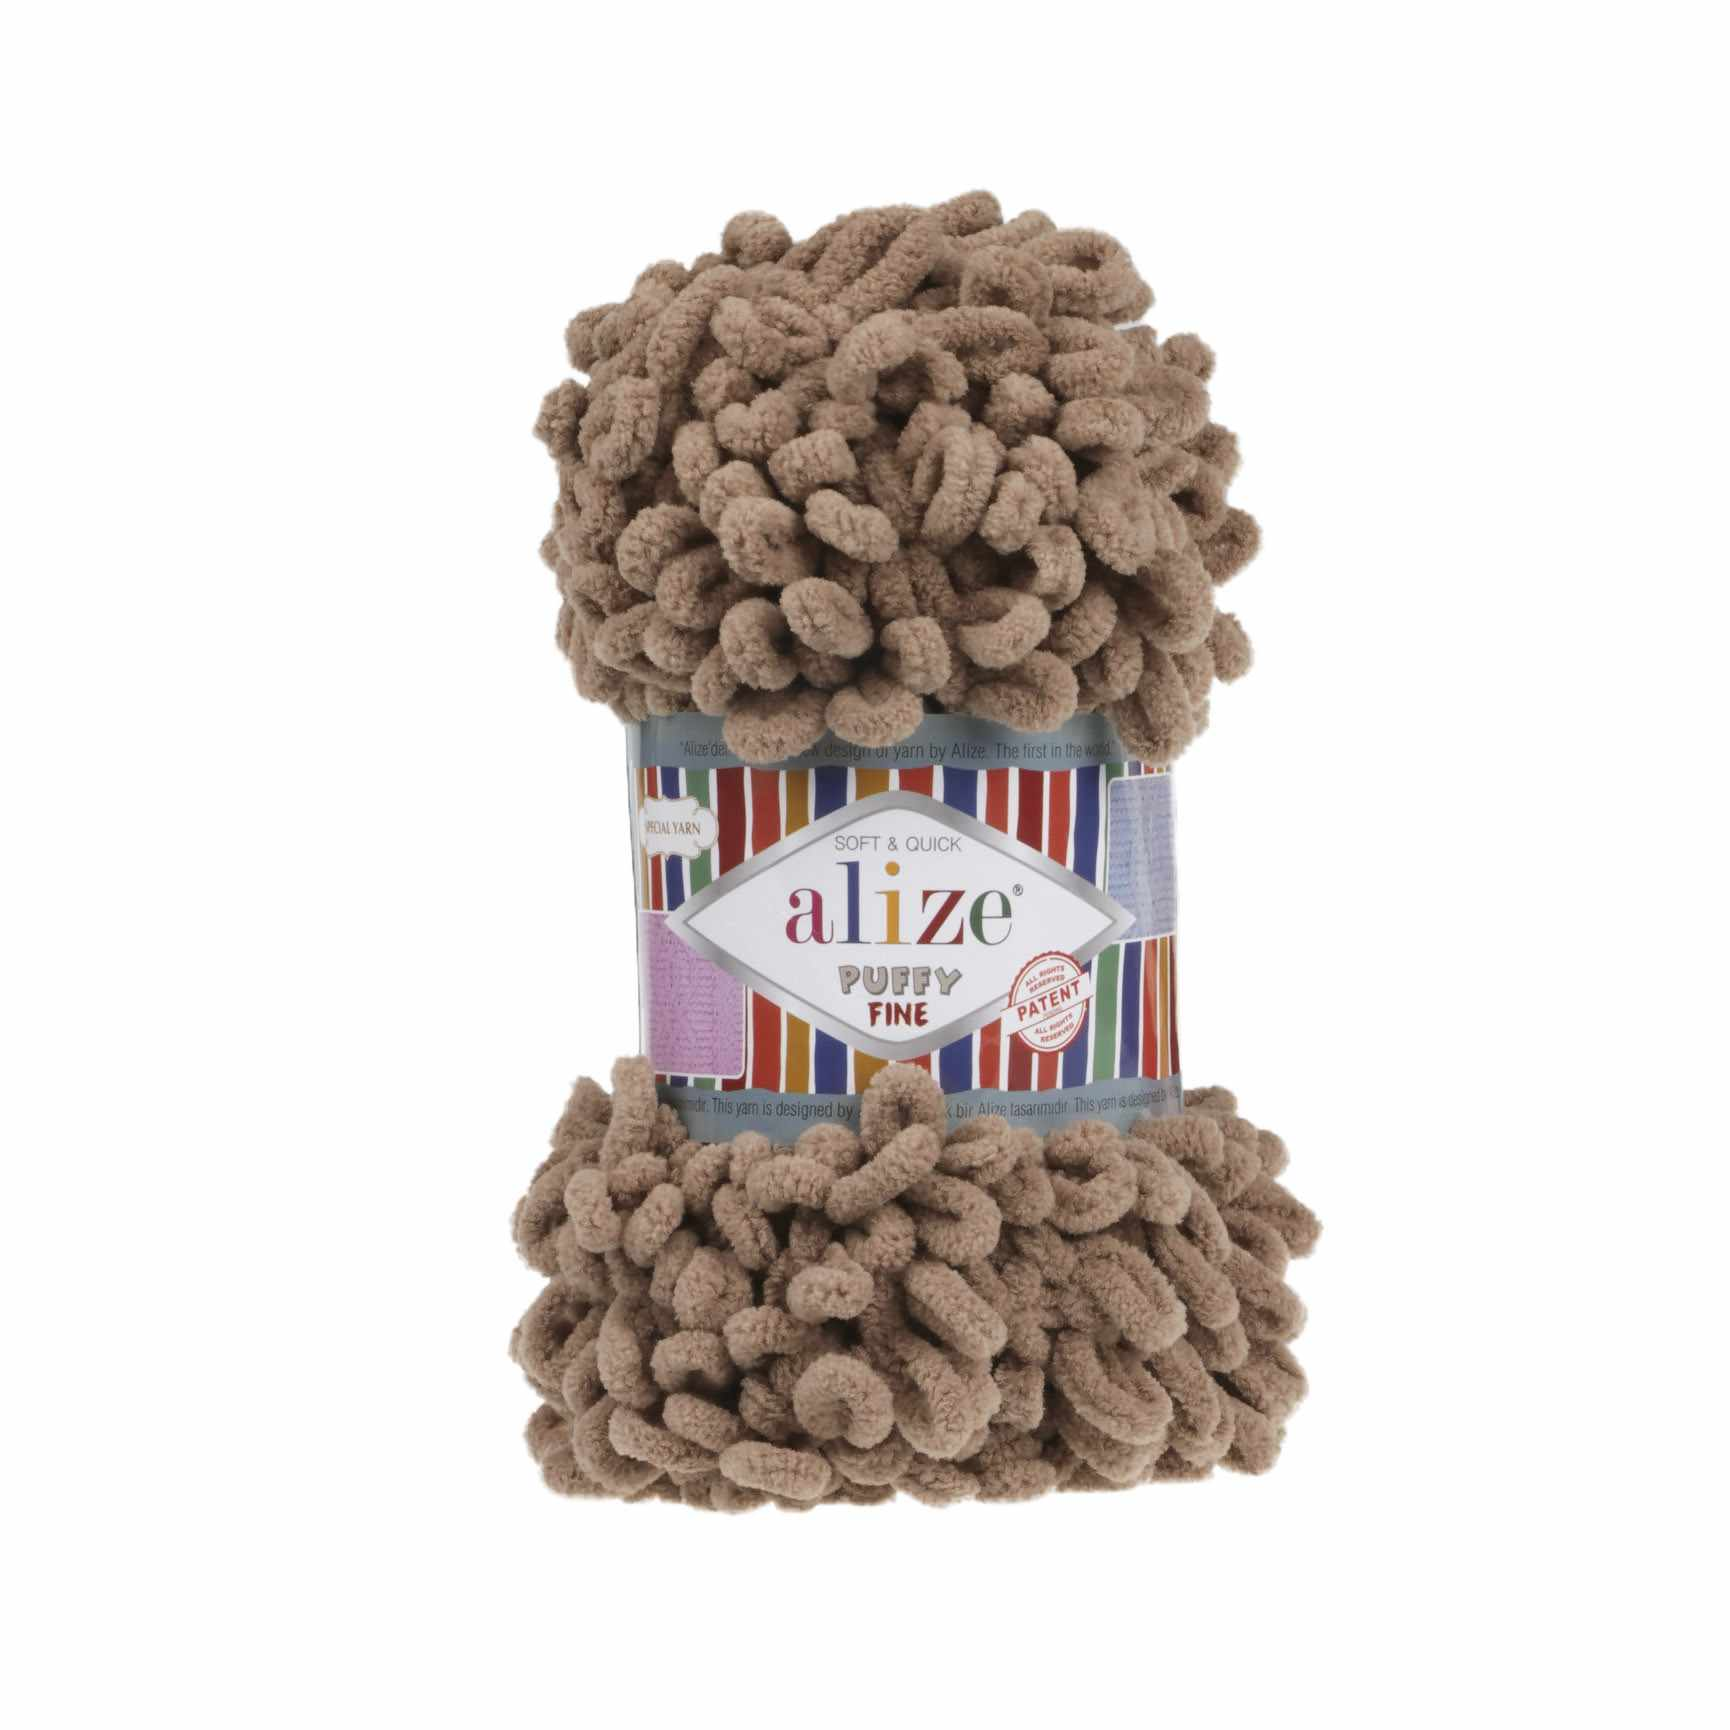 Пряжа Alize Puffy Fine Цвет.329 молочно-коричневый